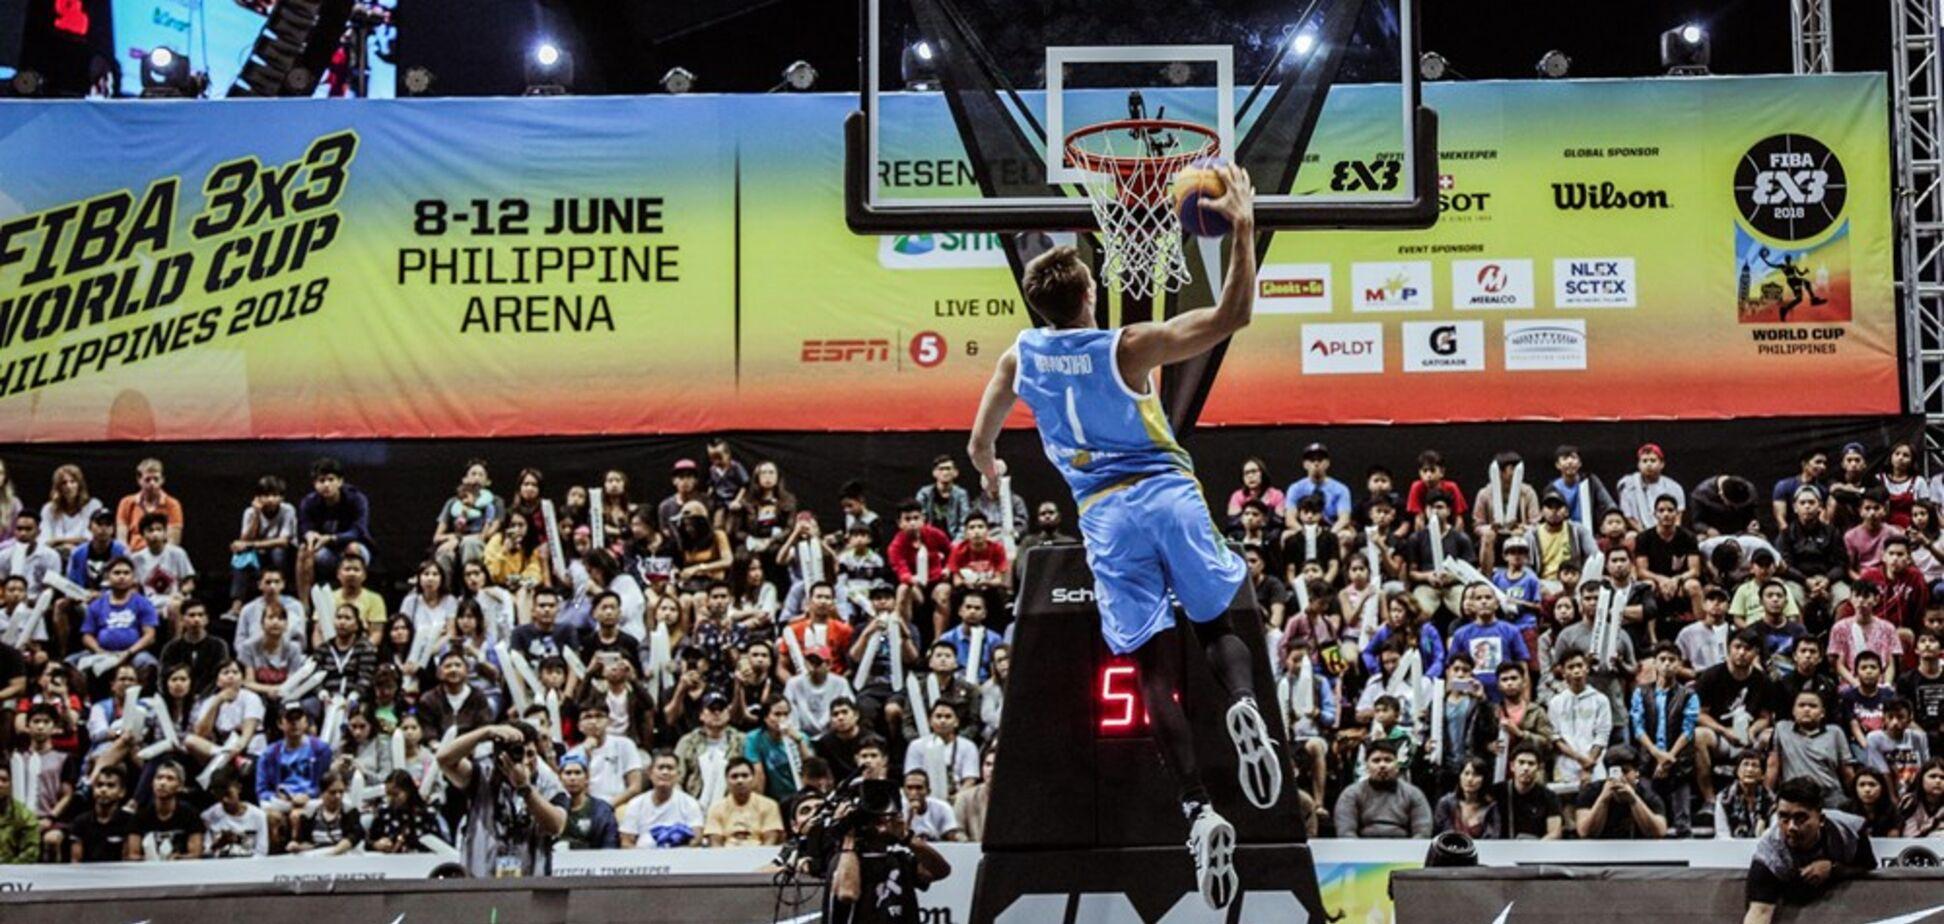 Украинский данкер выиграл 'золото' Кубка мира по баскетболу 3х3